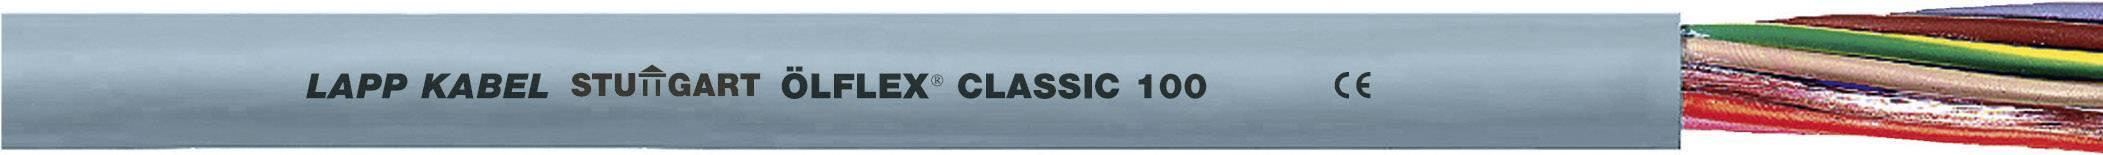 Kabel LappKabel Ölflex CLASSIC 100 4X0,5 (00101234), PVC, 5,7 mm, 500 V, šedá, 100 m